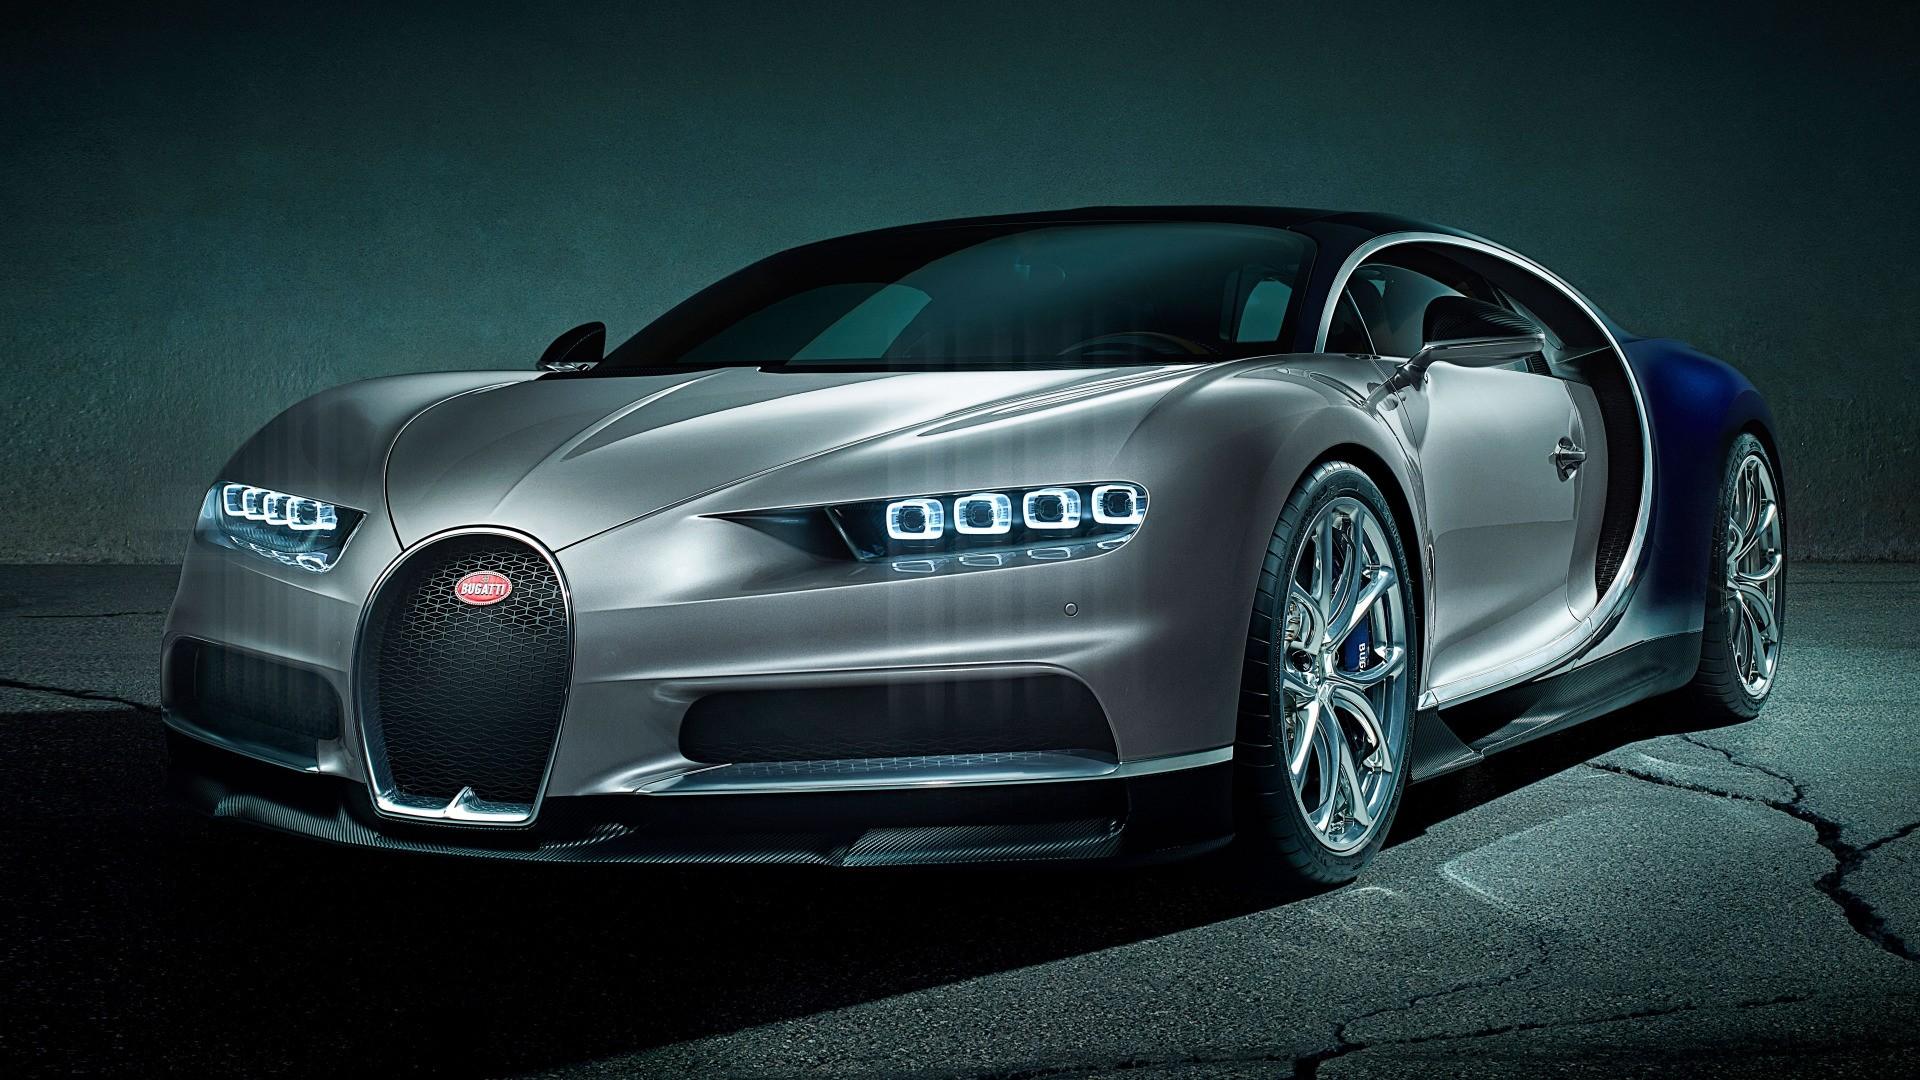 Bugatti Chiron Good Wallpaper